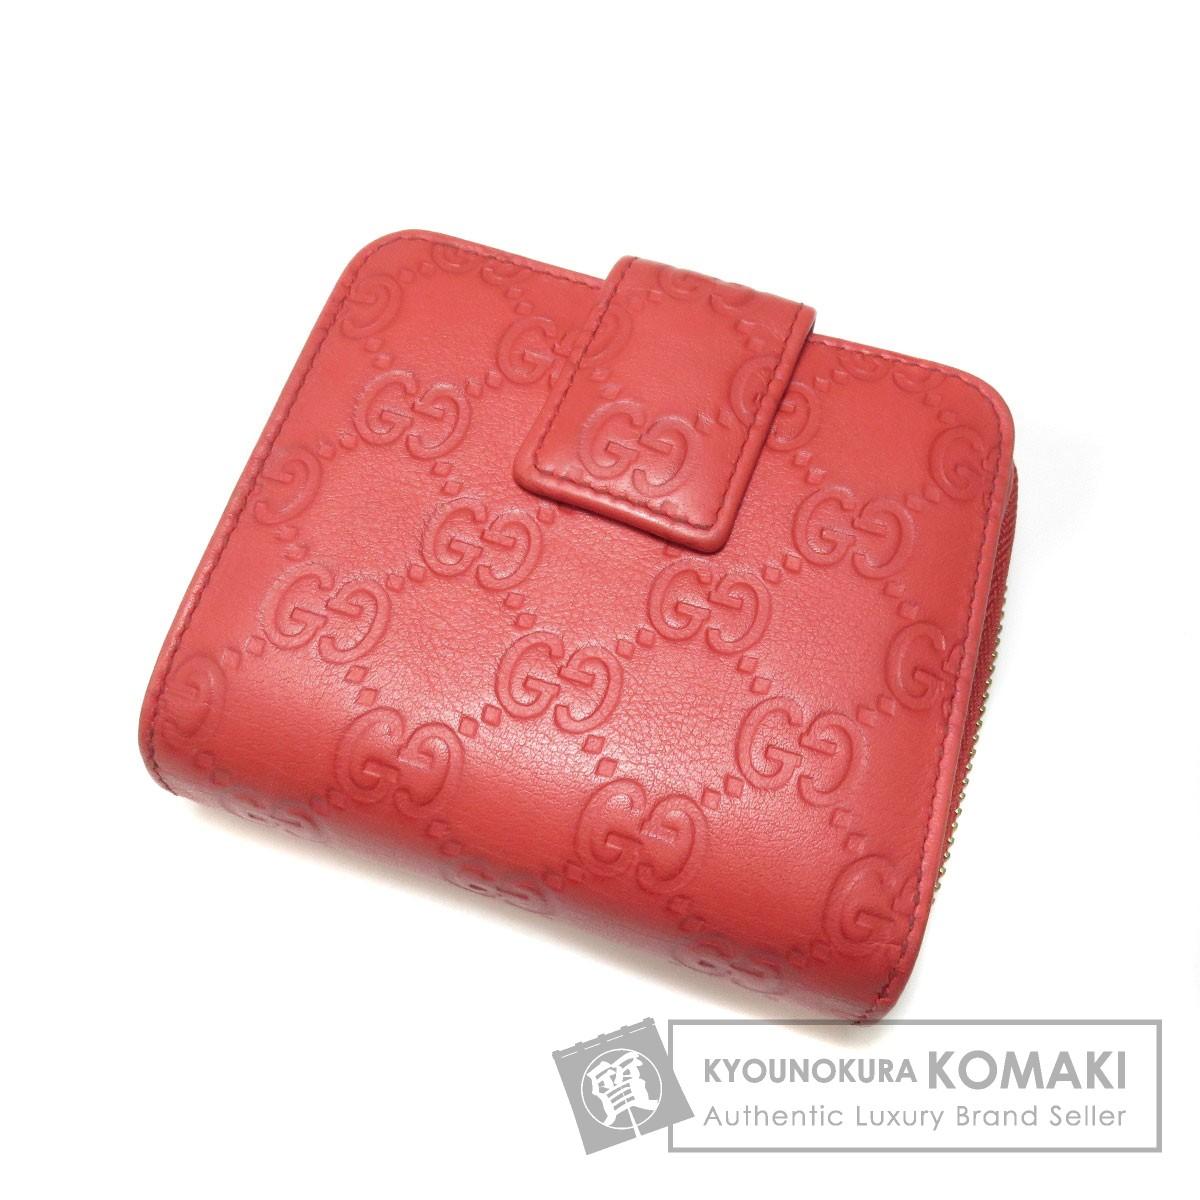 GUCCI GG シマ 二つ折り財布(小銭入れあり) レザー レディース 【中古】【グッチ】